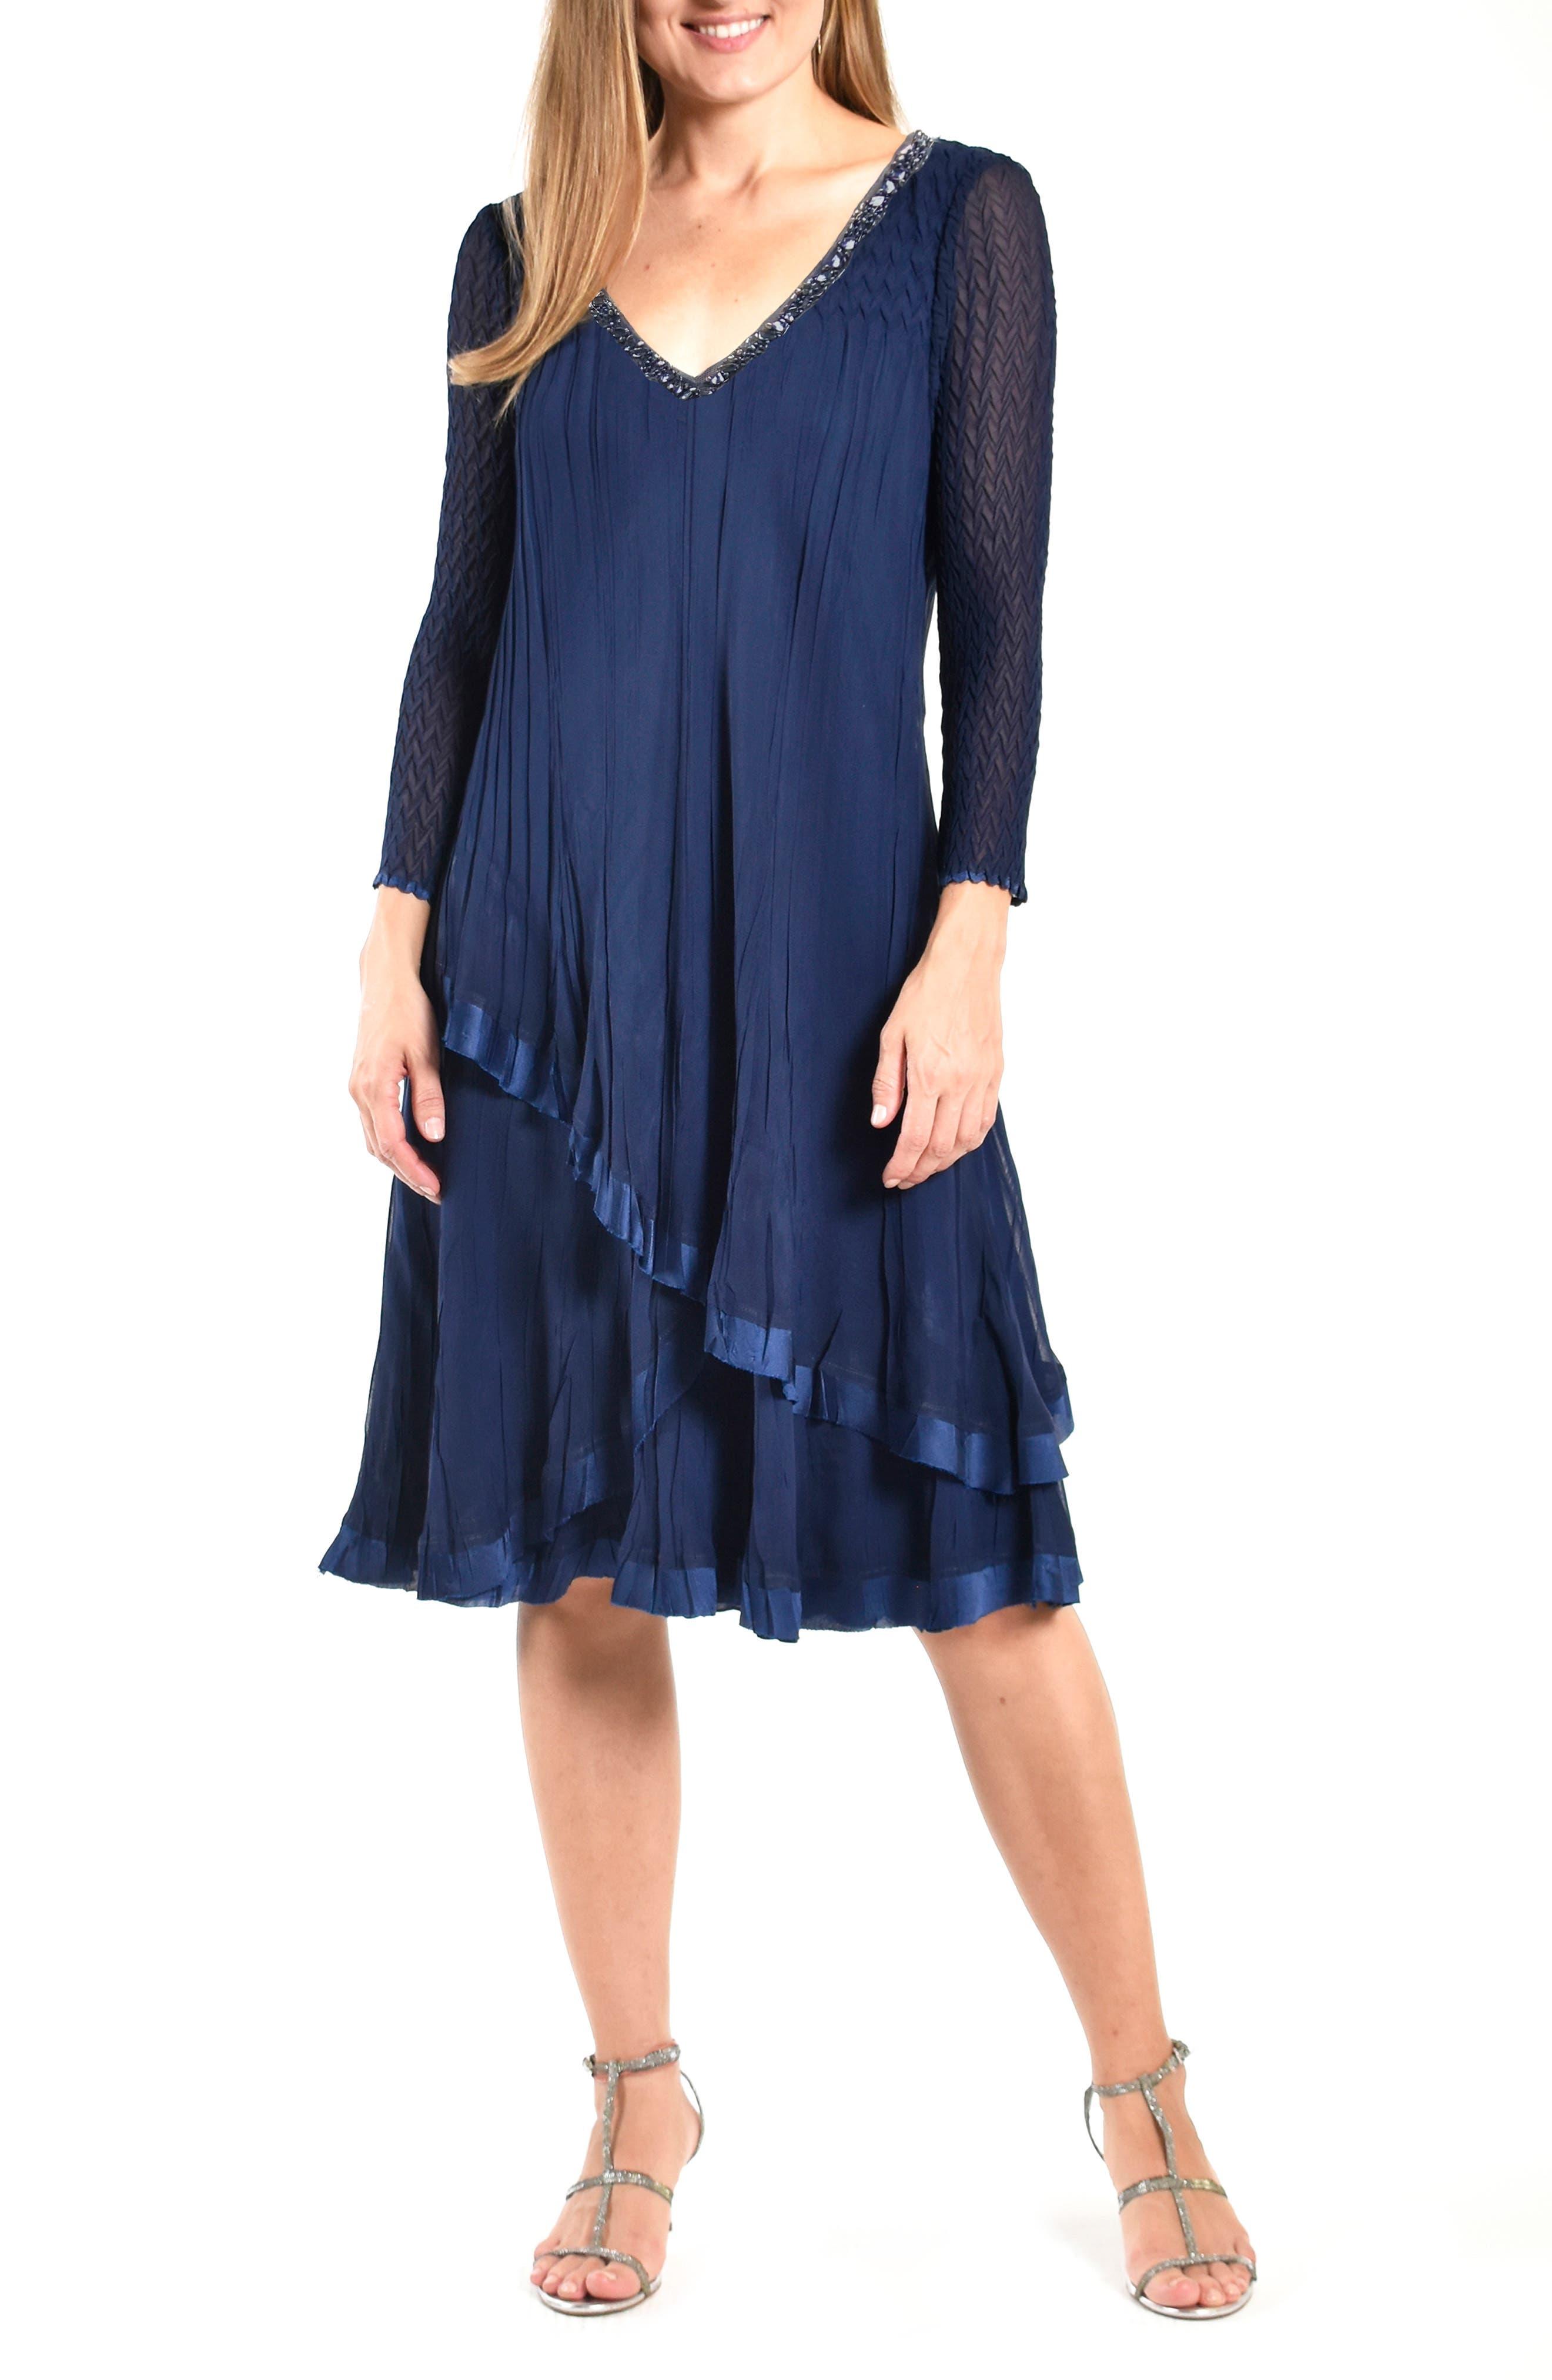 Beaded Long Sleeve Cocktail Dress